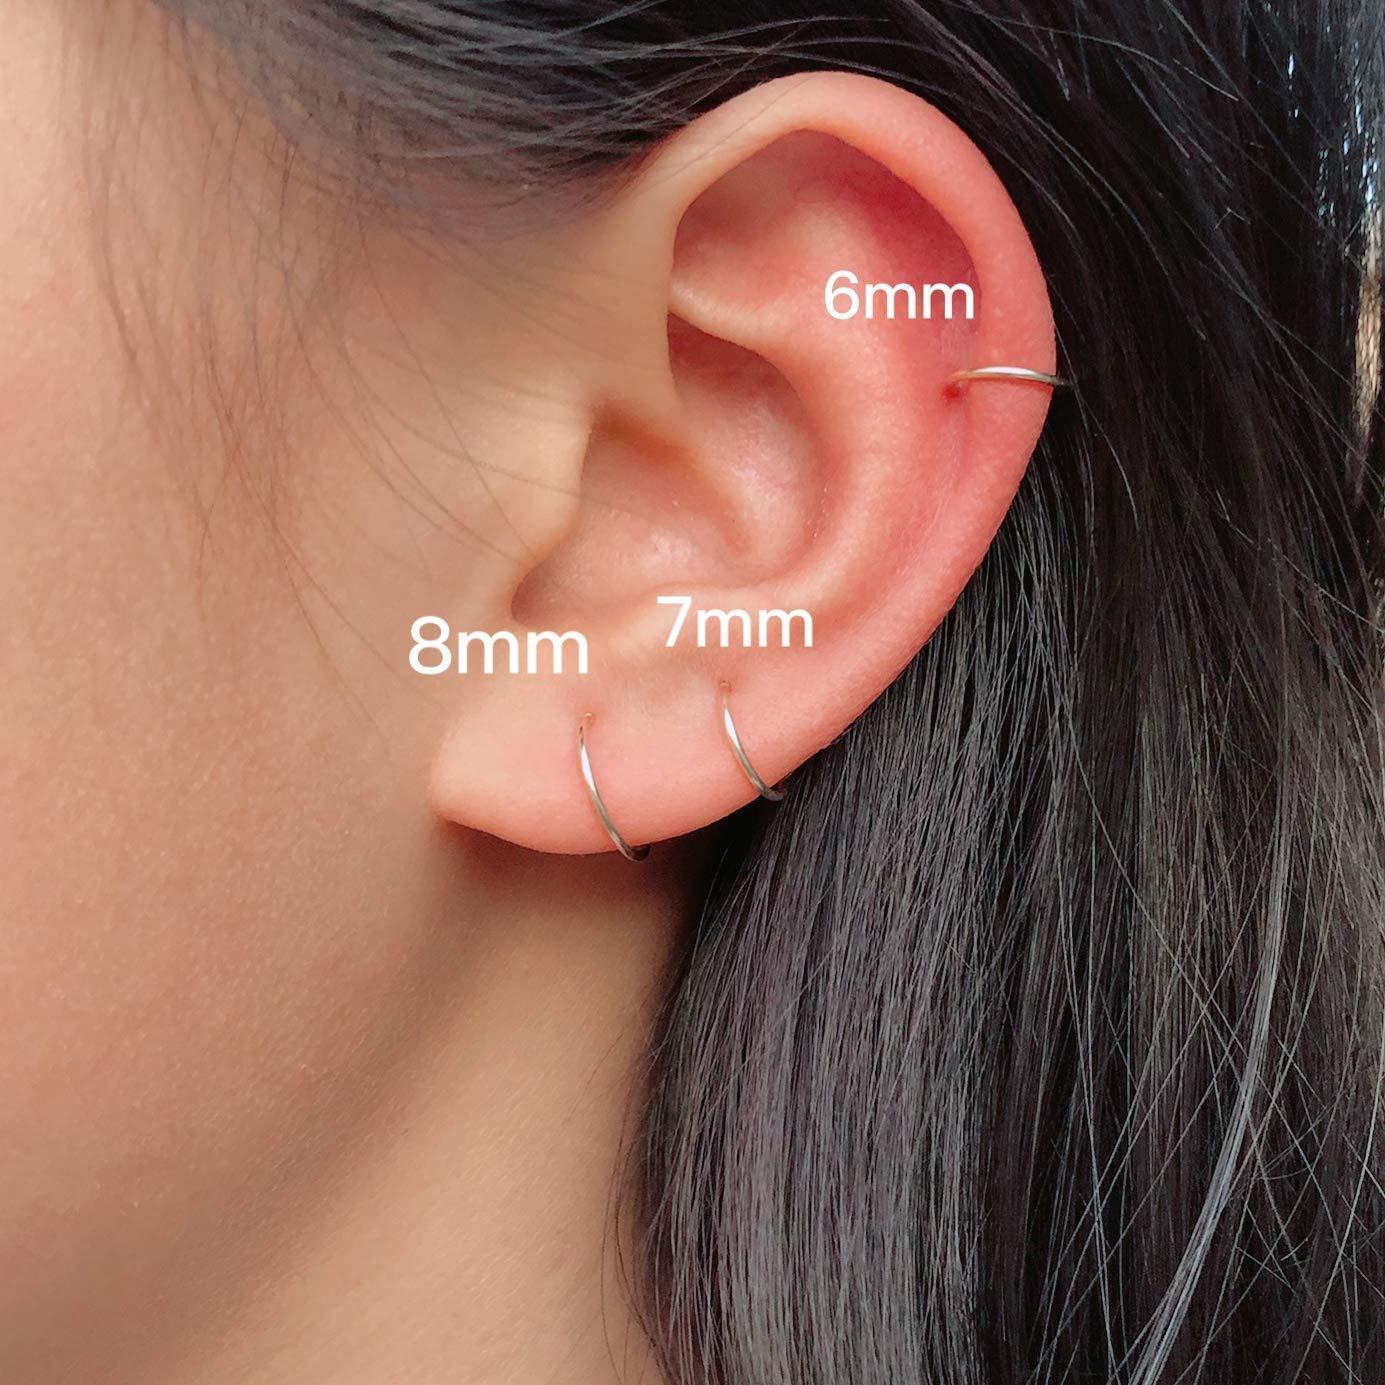 Mini Gold Hoop Earrings Set for Cartilage Piercing,14K Gold Filled Tiny Hoop Earrings 6mm 7mm 8mm